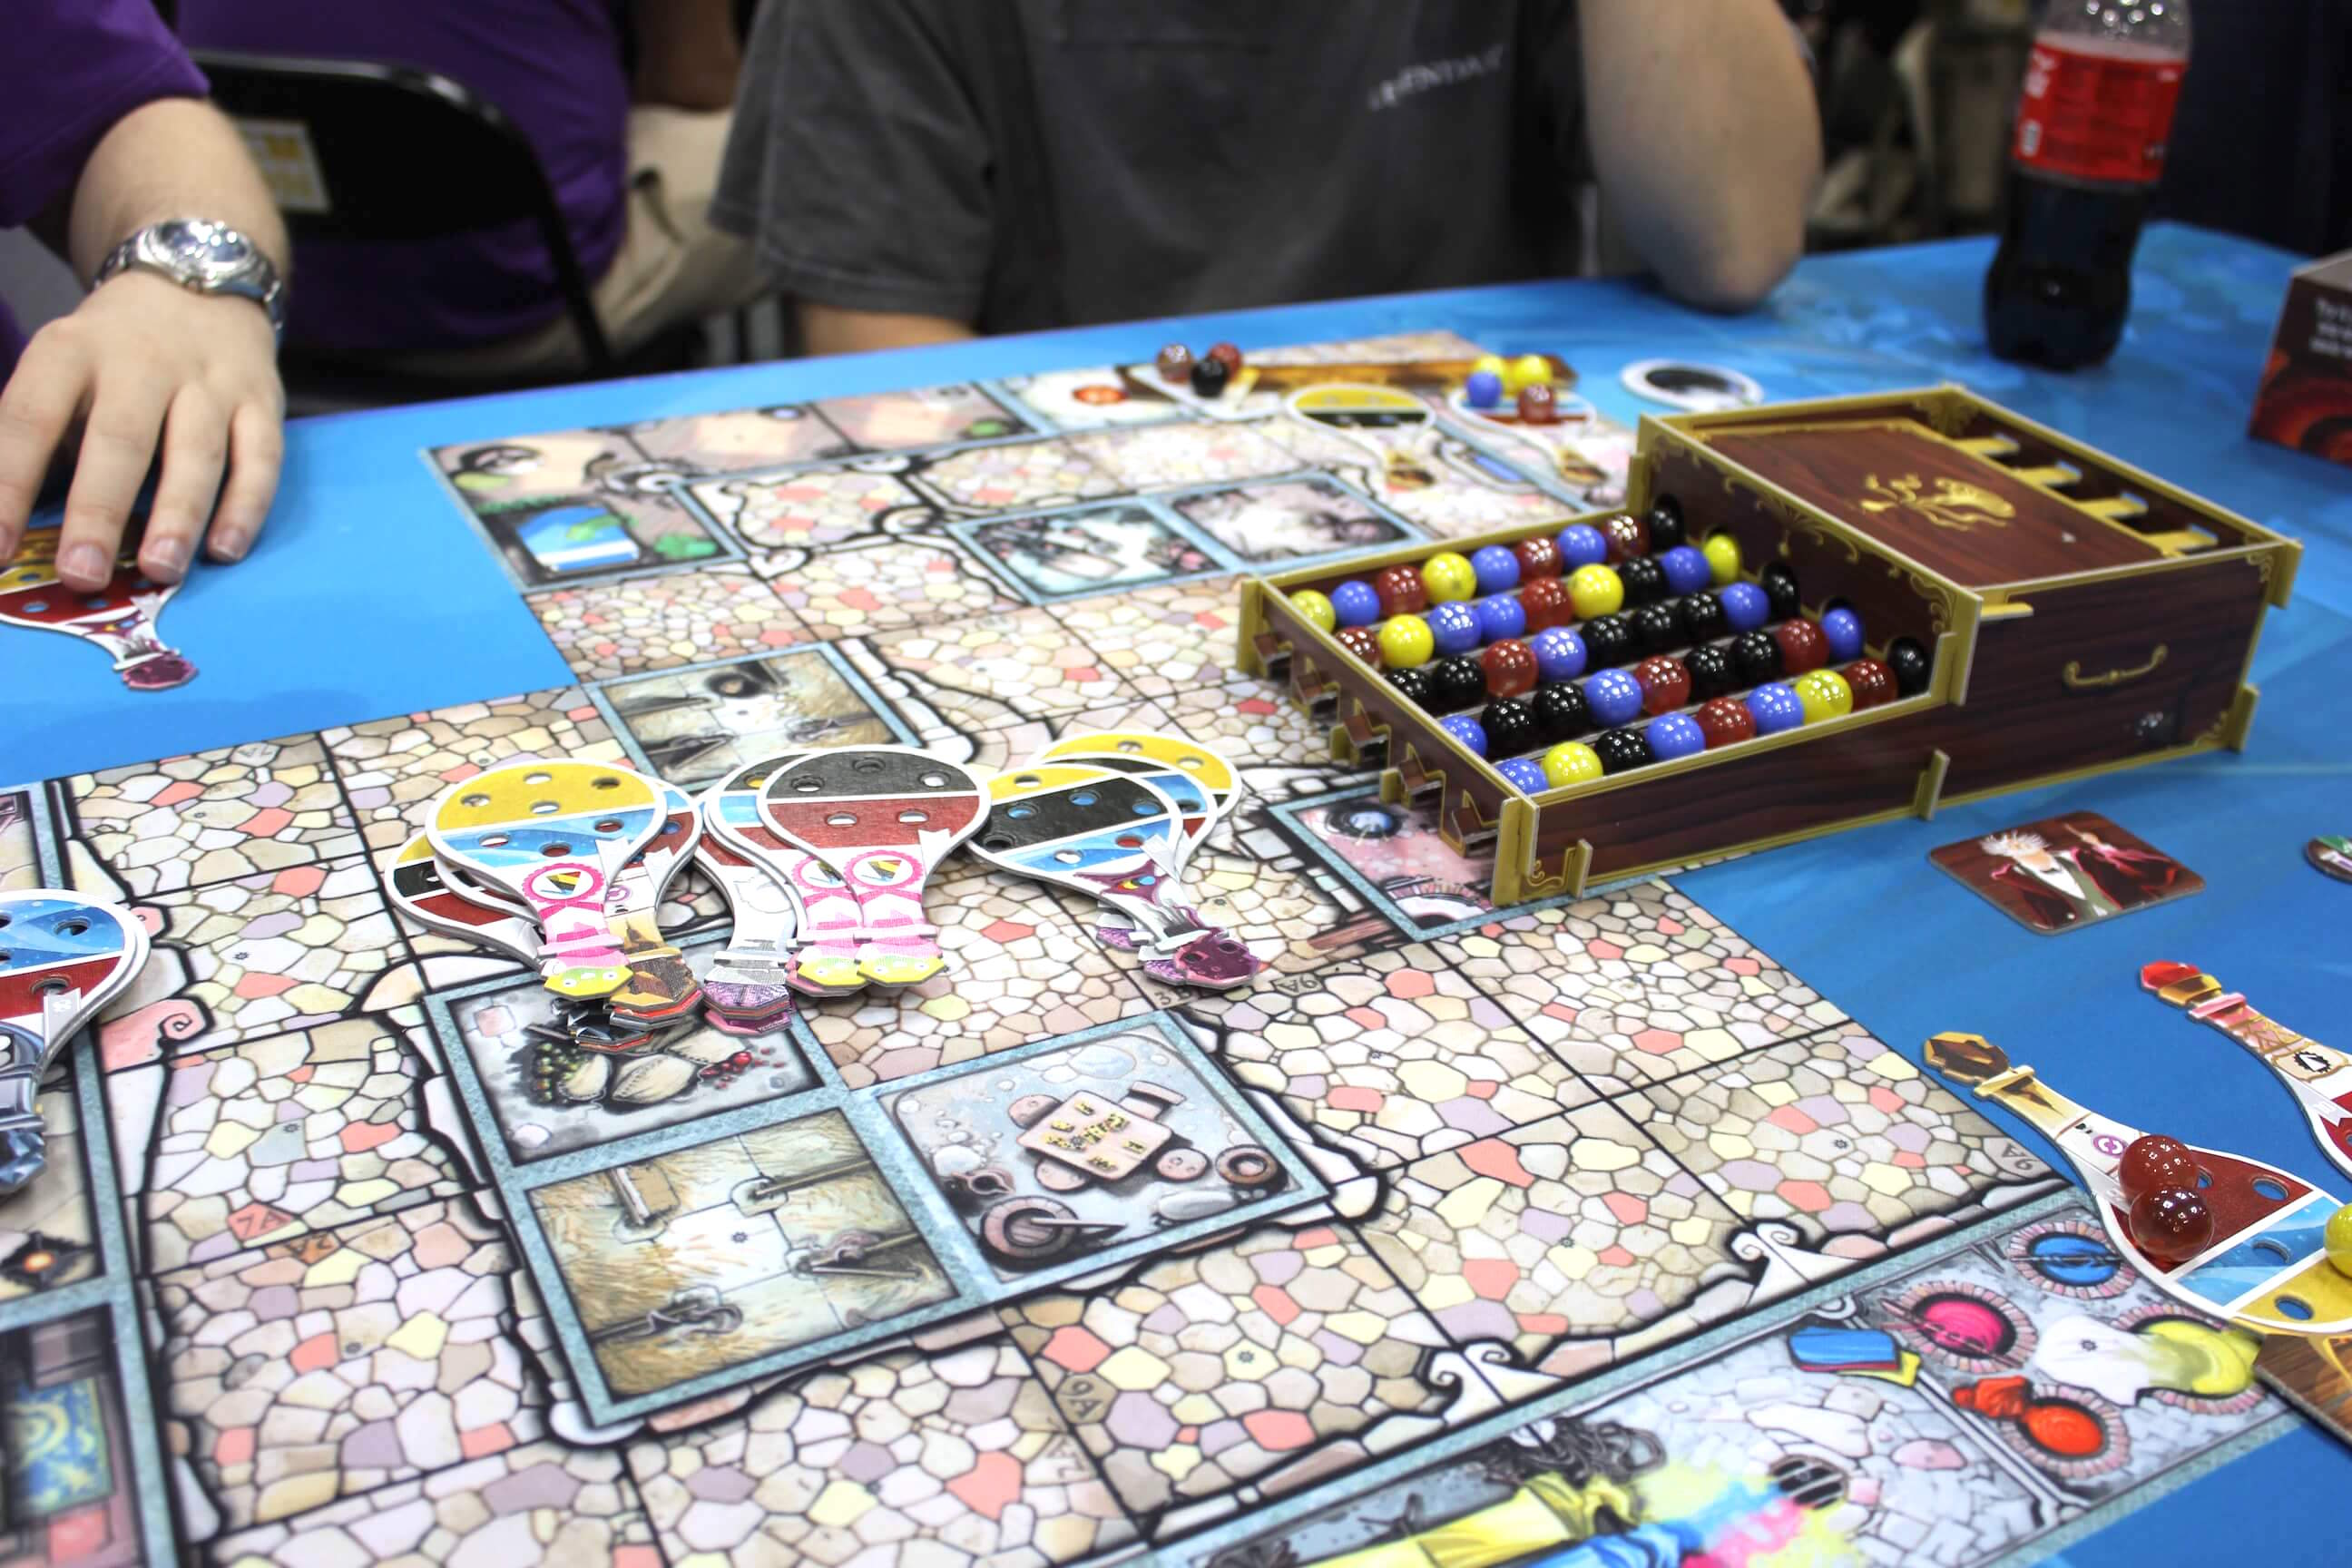 Ars Cardboard S Board Game T Guide